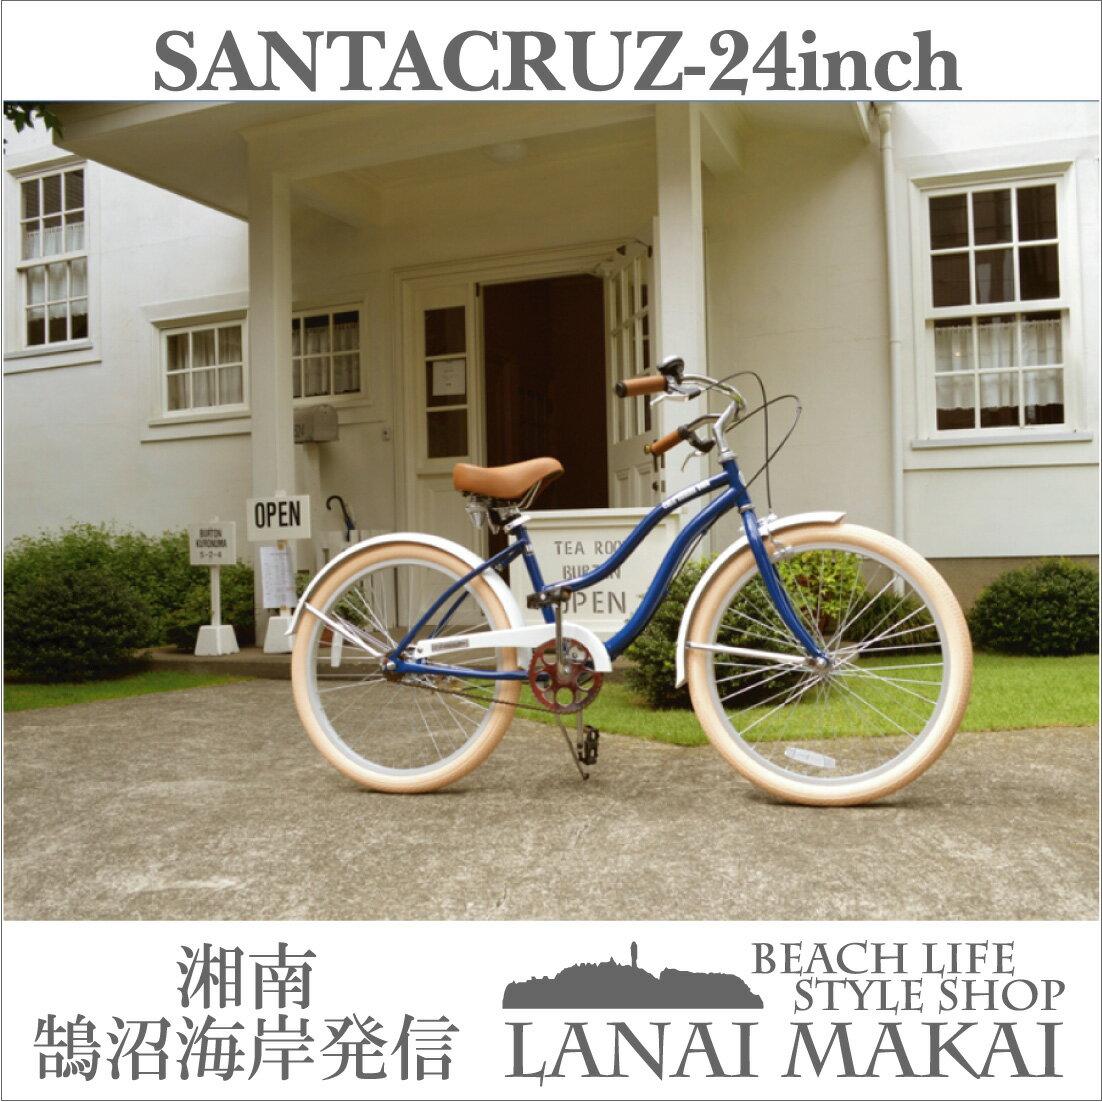 "【SANTACRUZ-24inchビーチクルーザー】""湘南鵠沼海岸発信"" 【女性にとっても優しい!!】24インチビーチクルーザー♪"